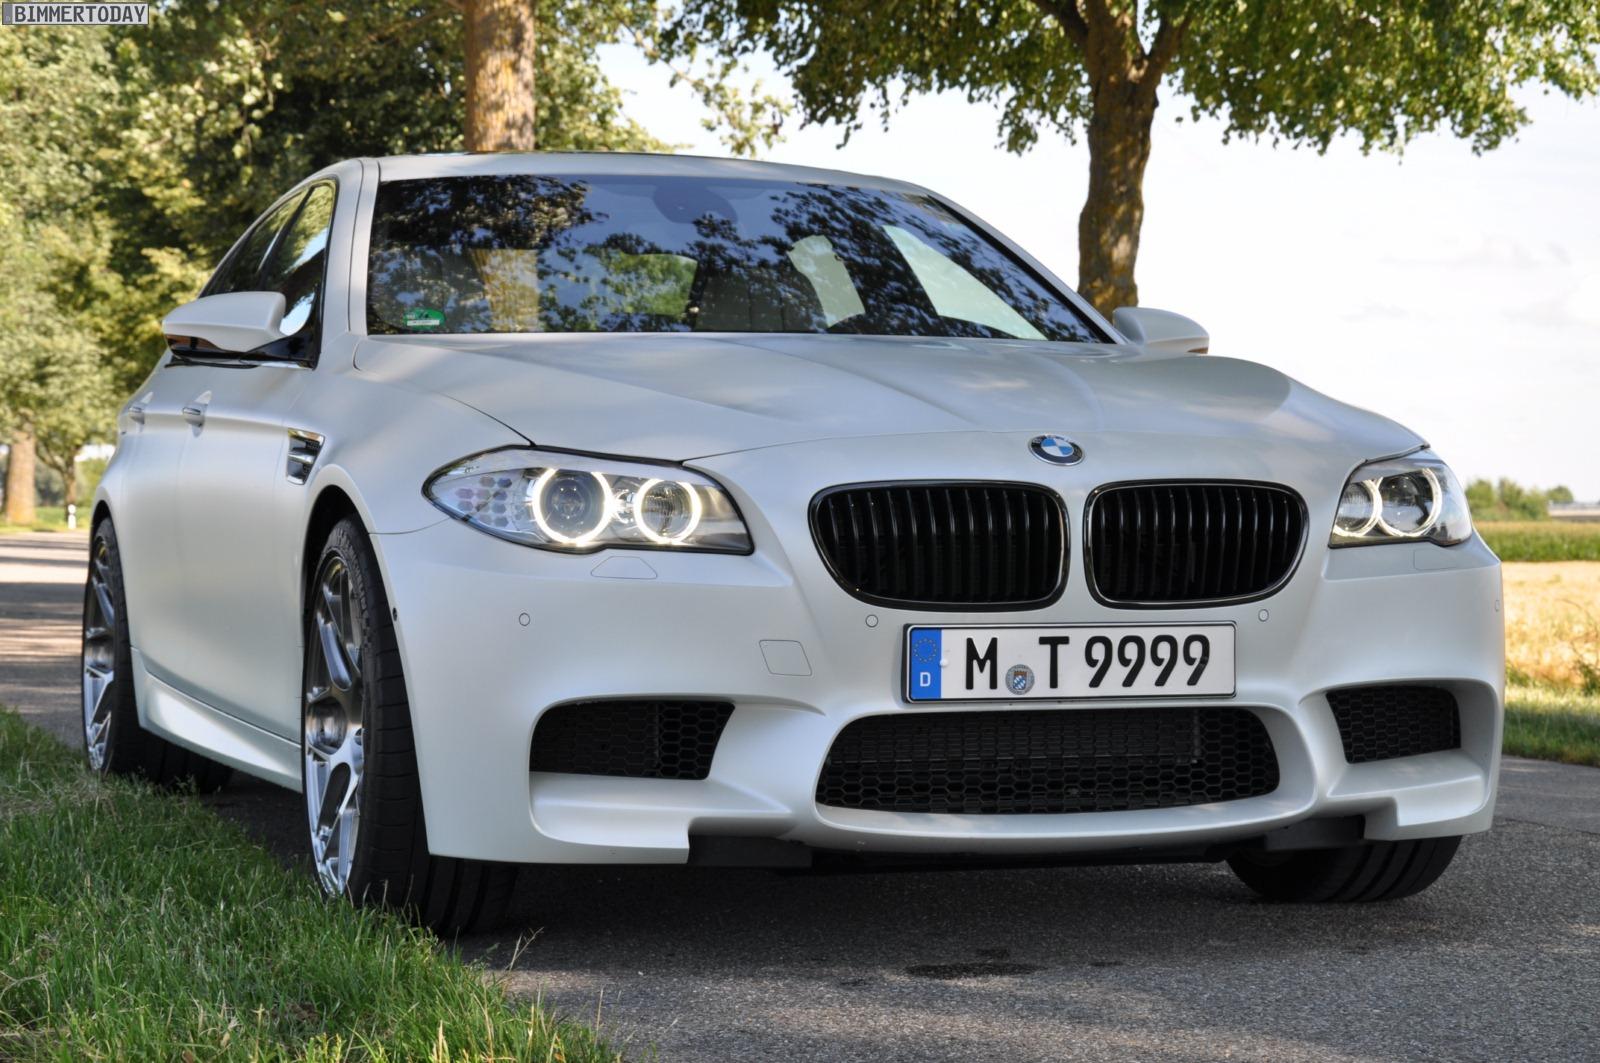 BMW M5 F10 Frozen White Individual 2012 031